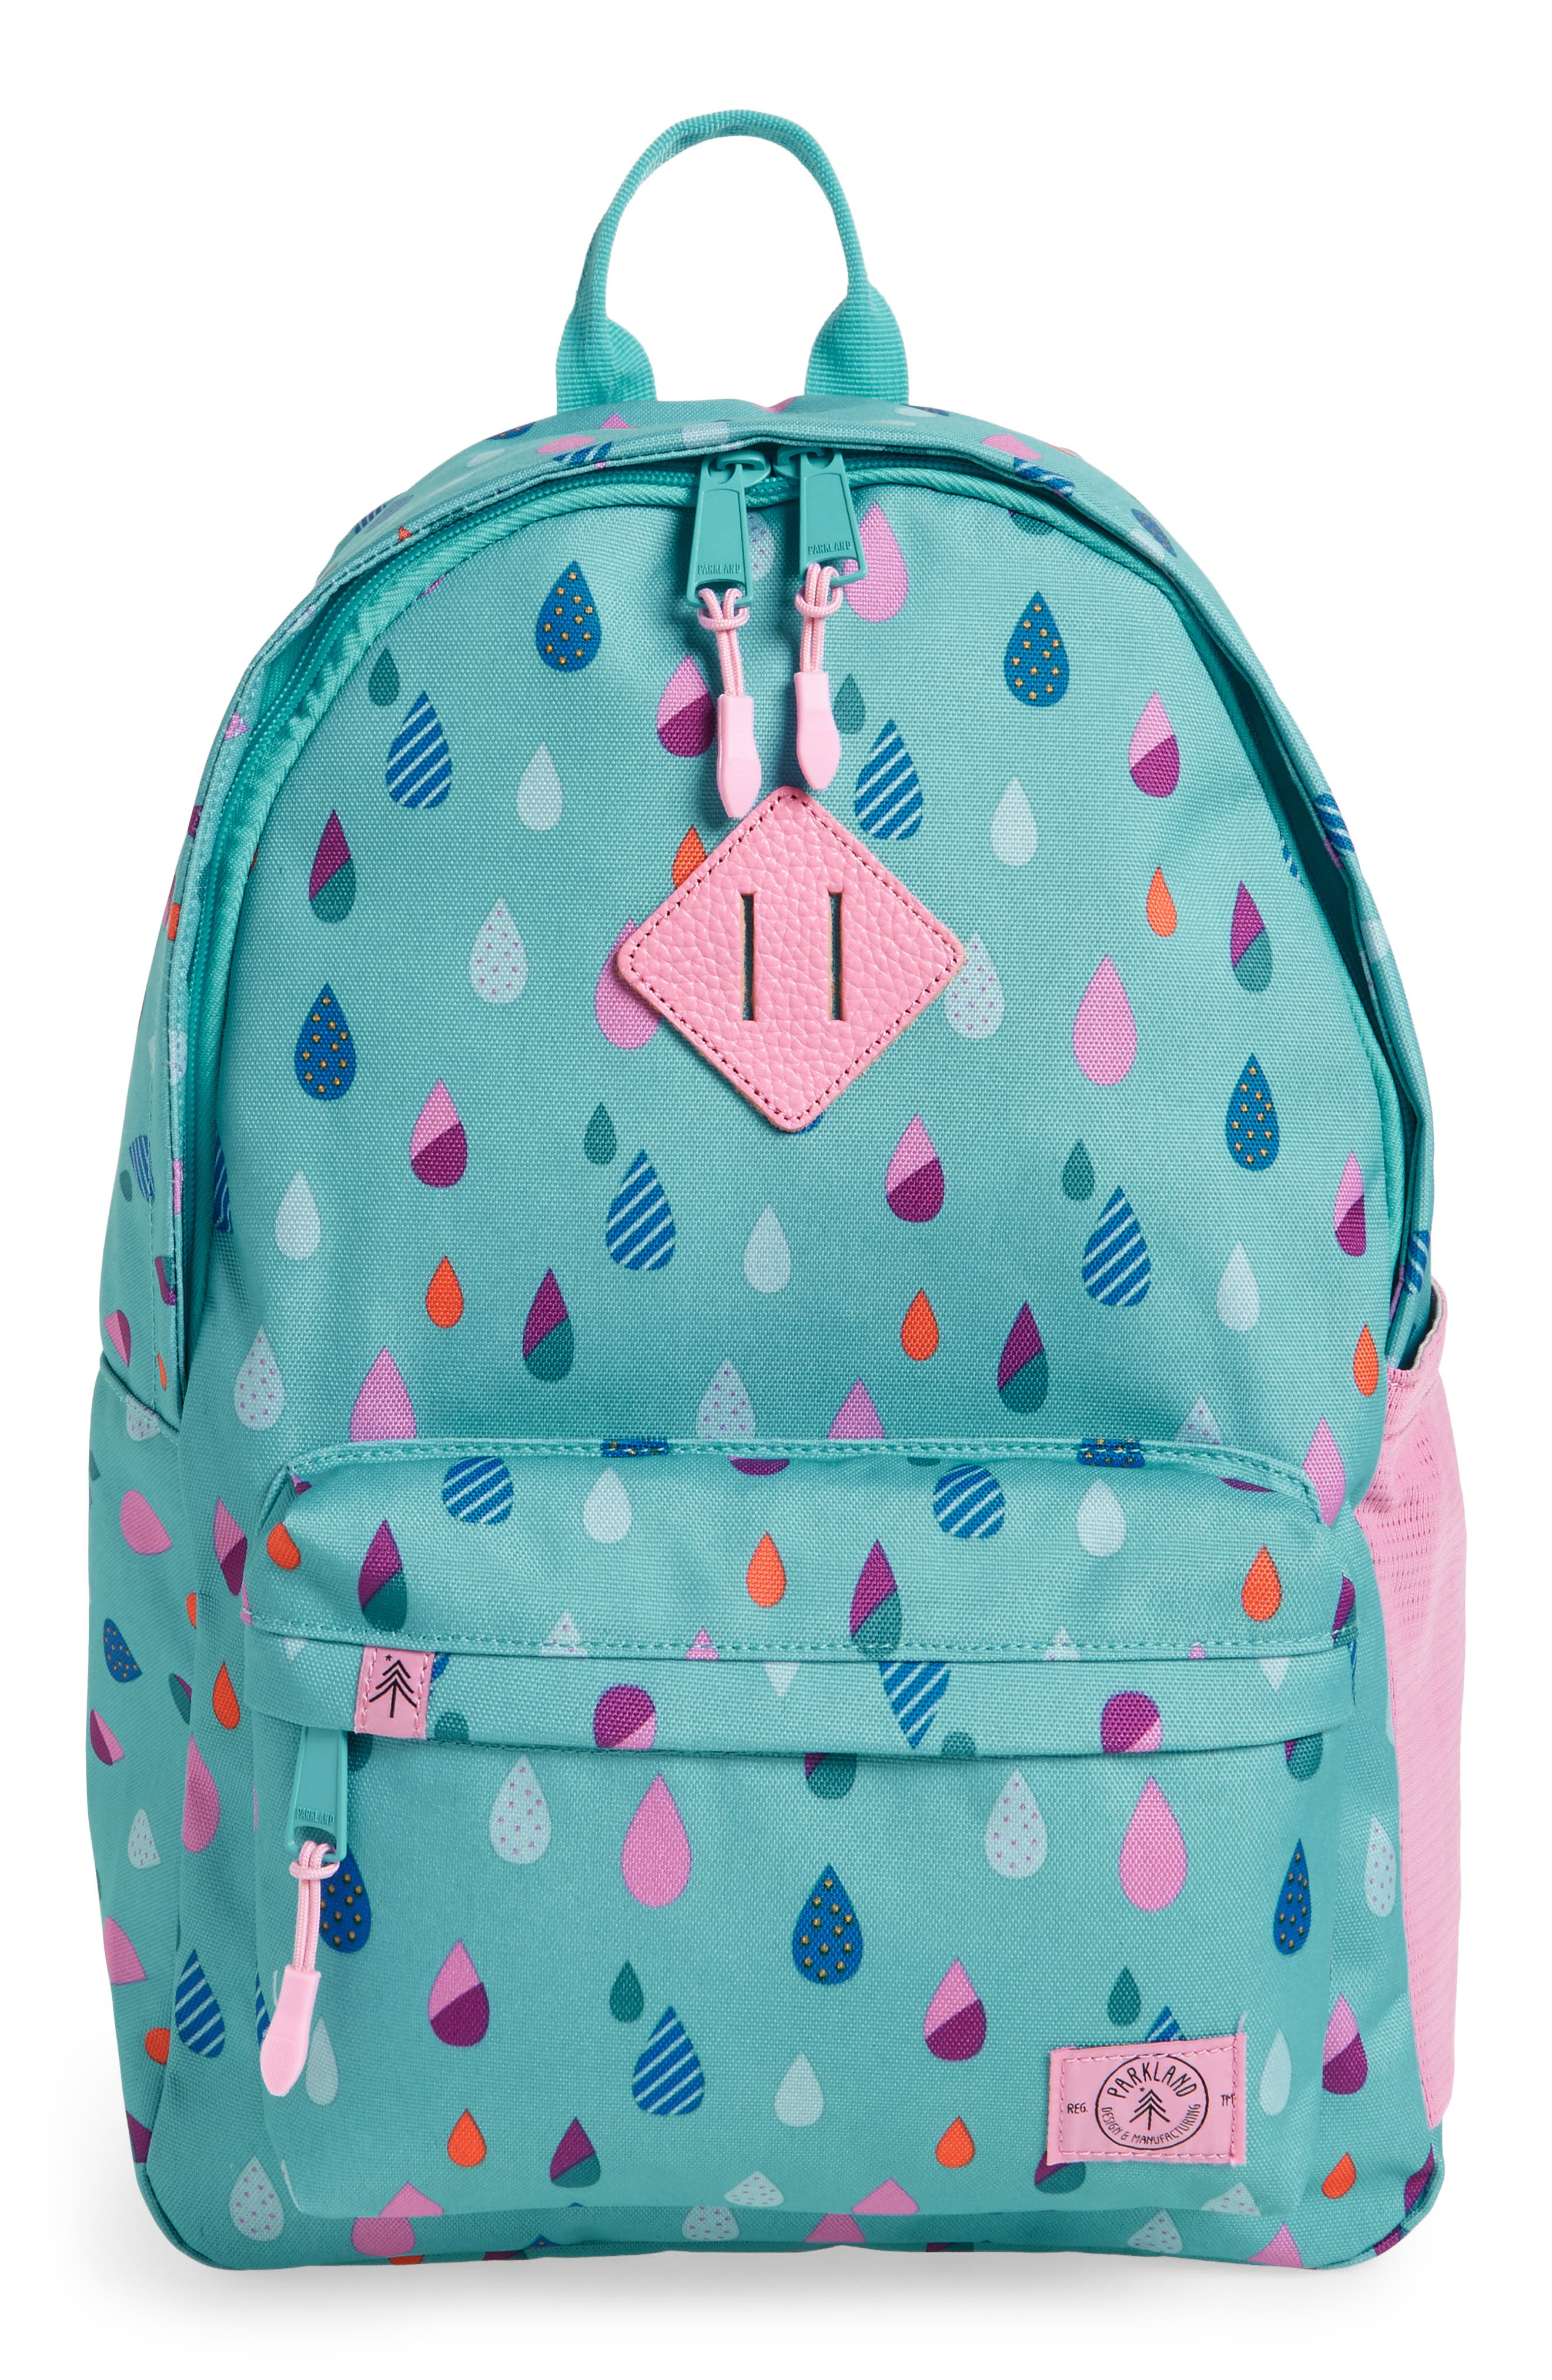 Bayside - Puddles Backpack,                         Main,                         color, Blue